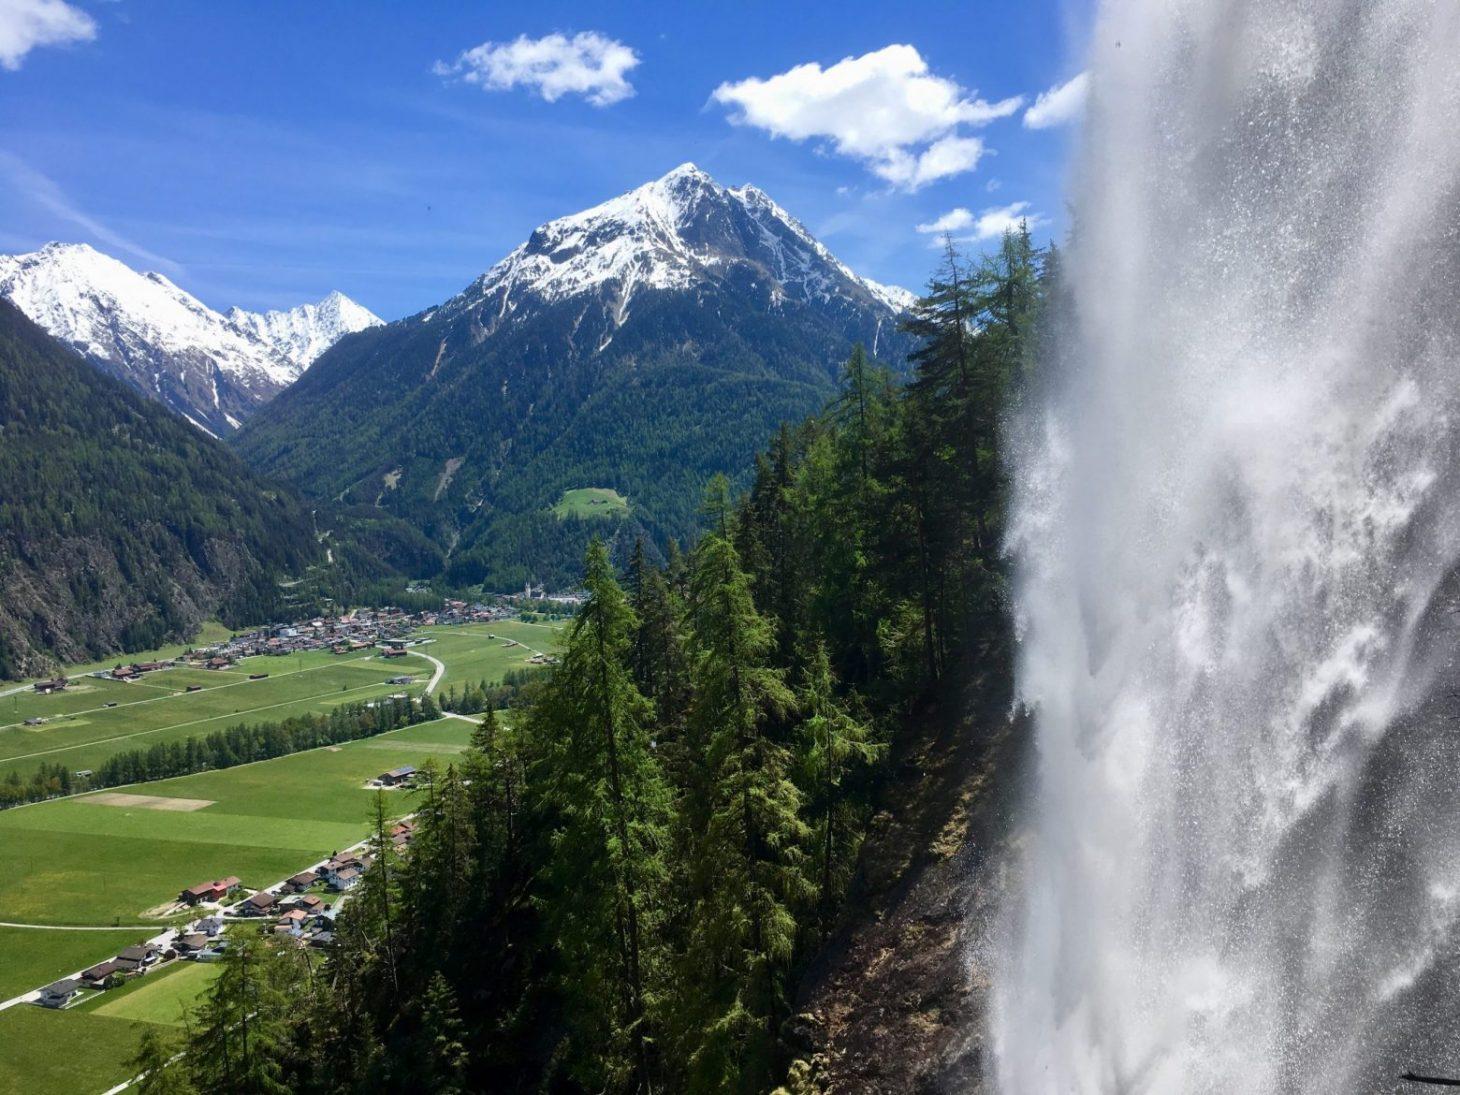 Via verrata at Lehner waterfall